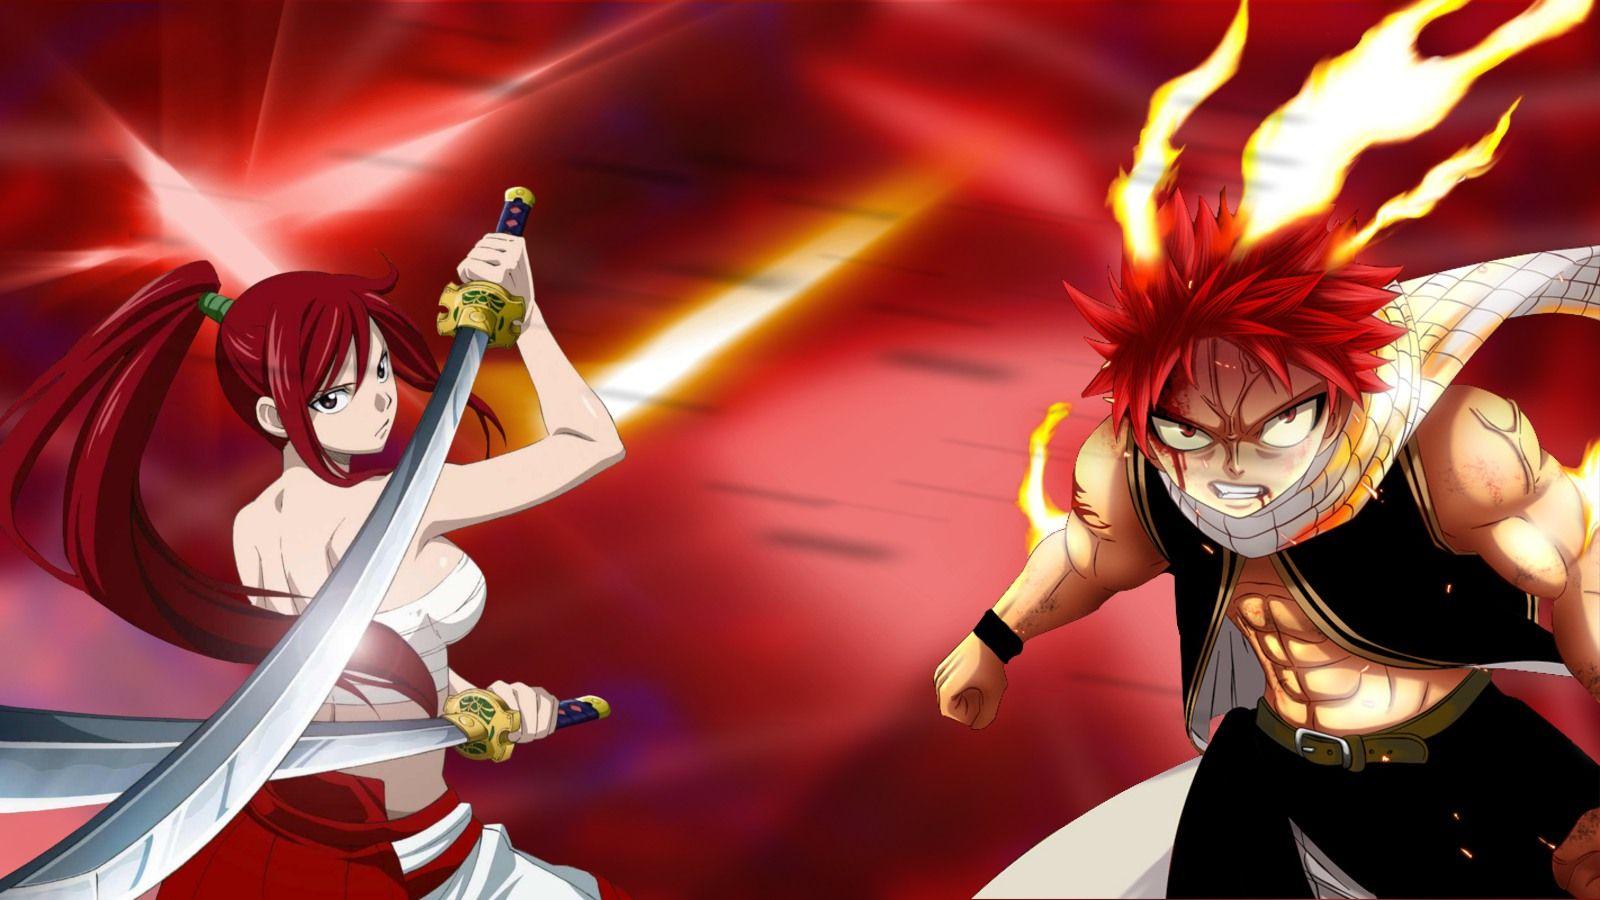 Fairy Tail Anime Anime fairy tail, Anime, Descargar